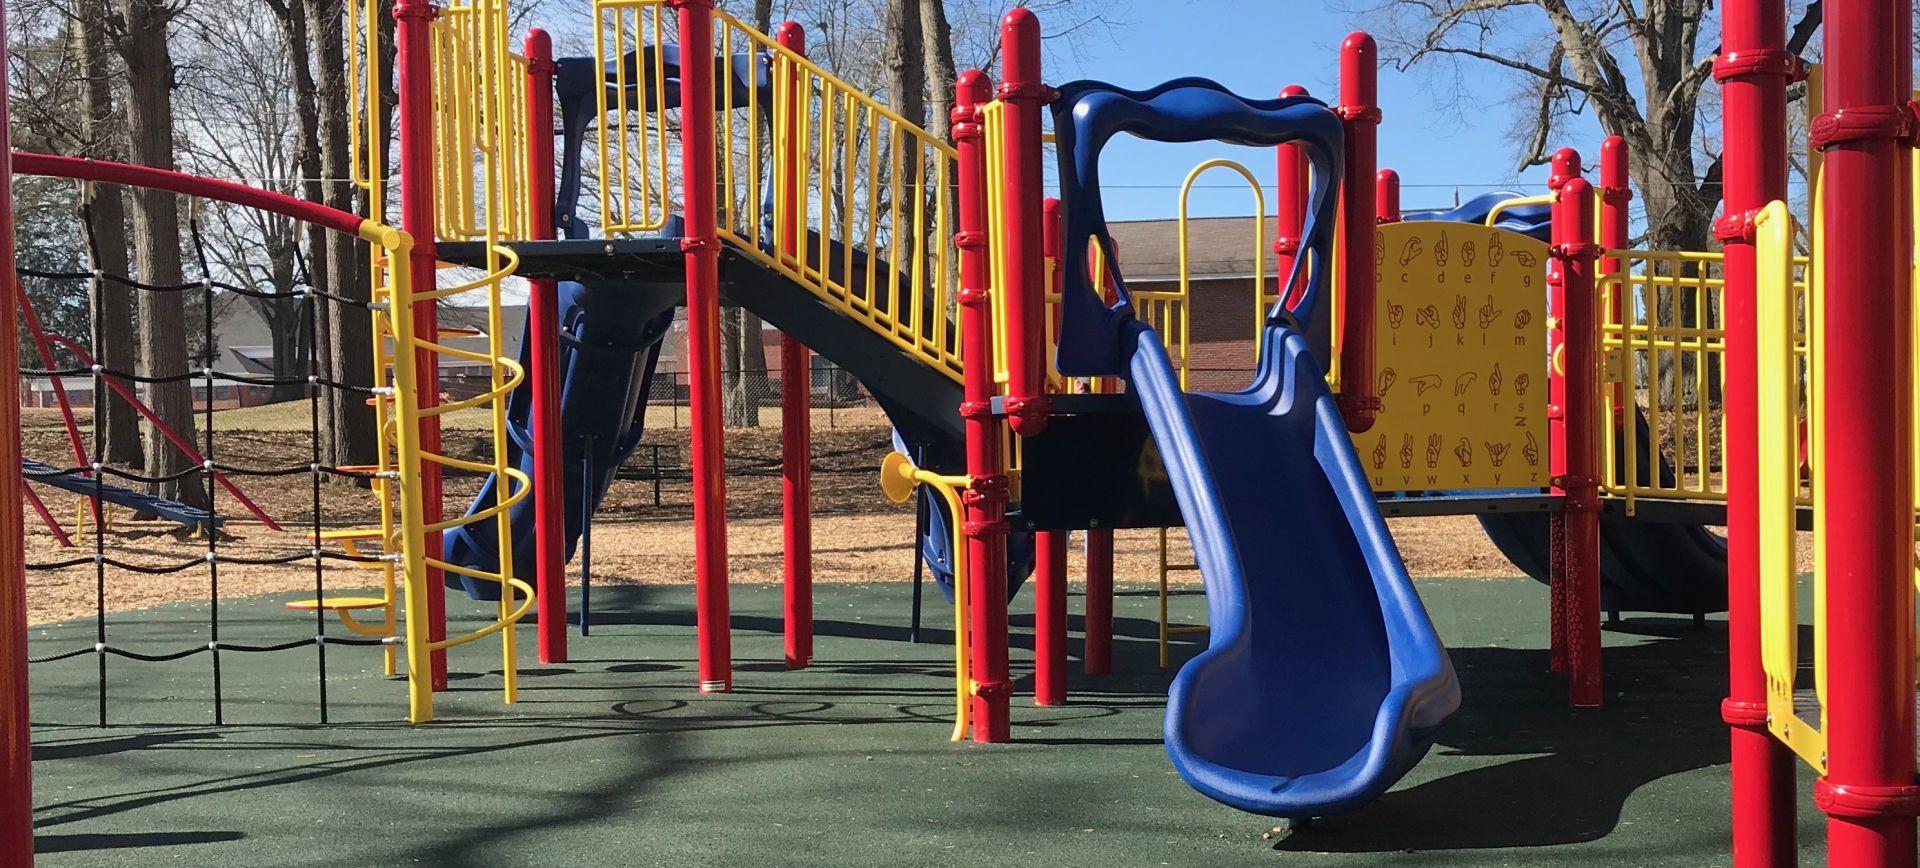 New Simpsonville City Park